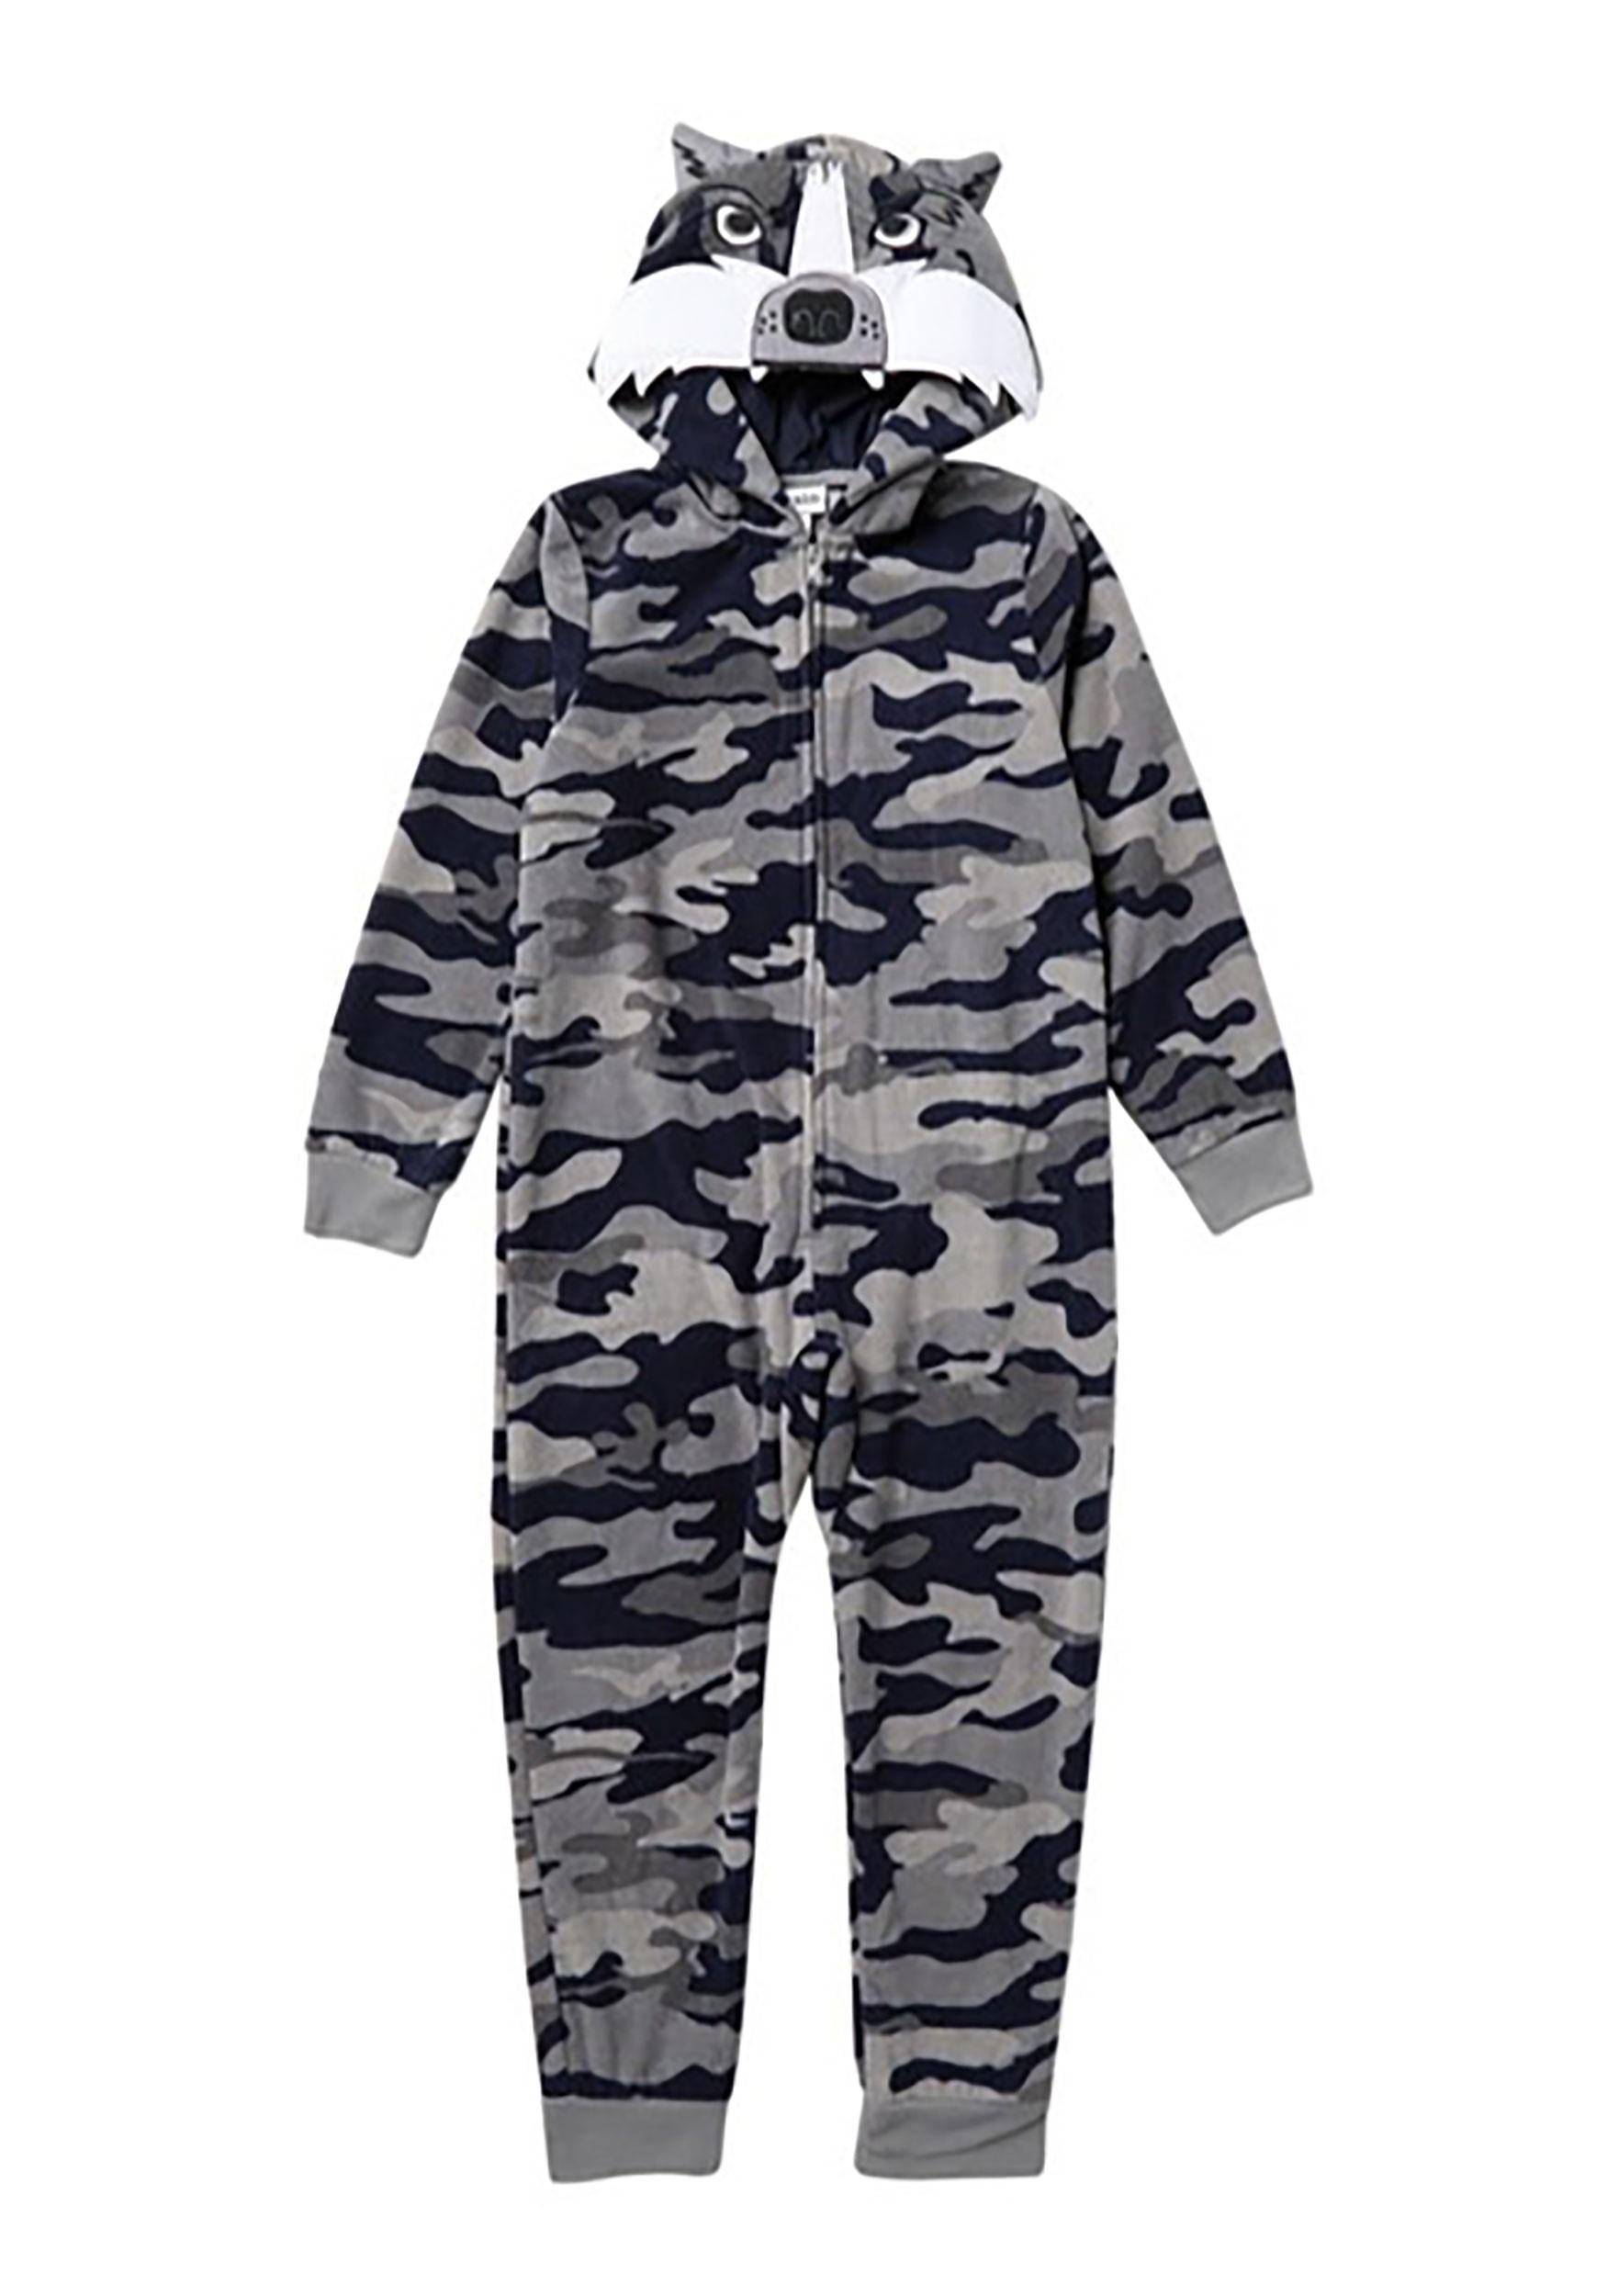 Fortnite Rex Size 8 Medium Boys Union Suit One Piece Pajama Costume Dinosaur NEW